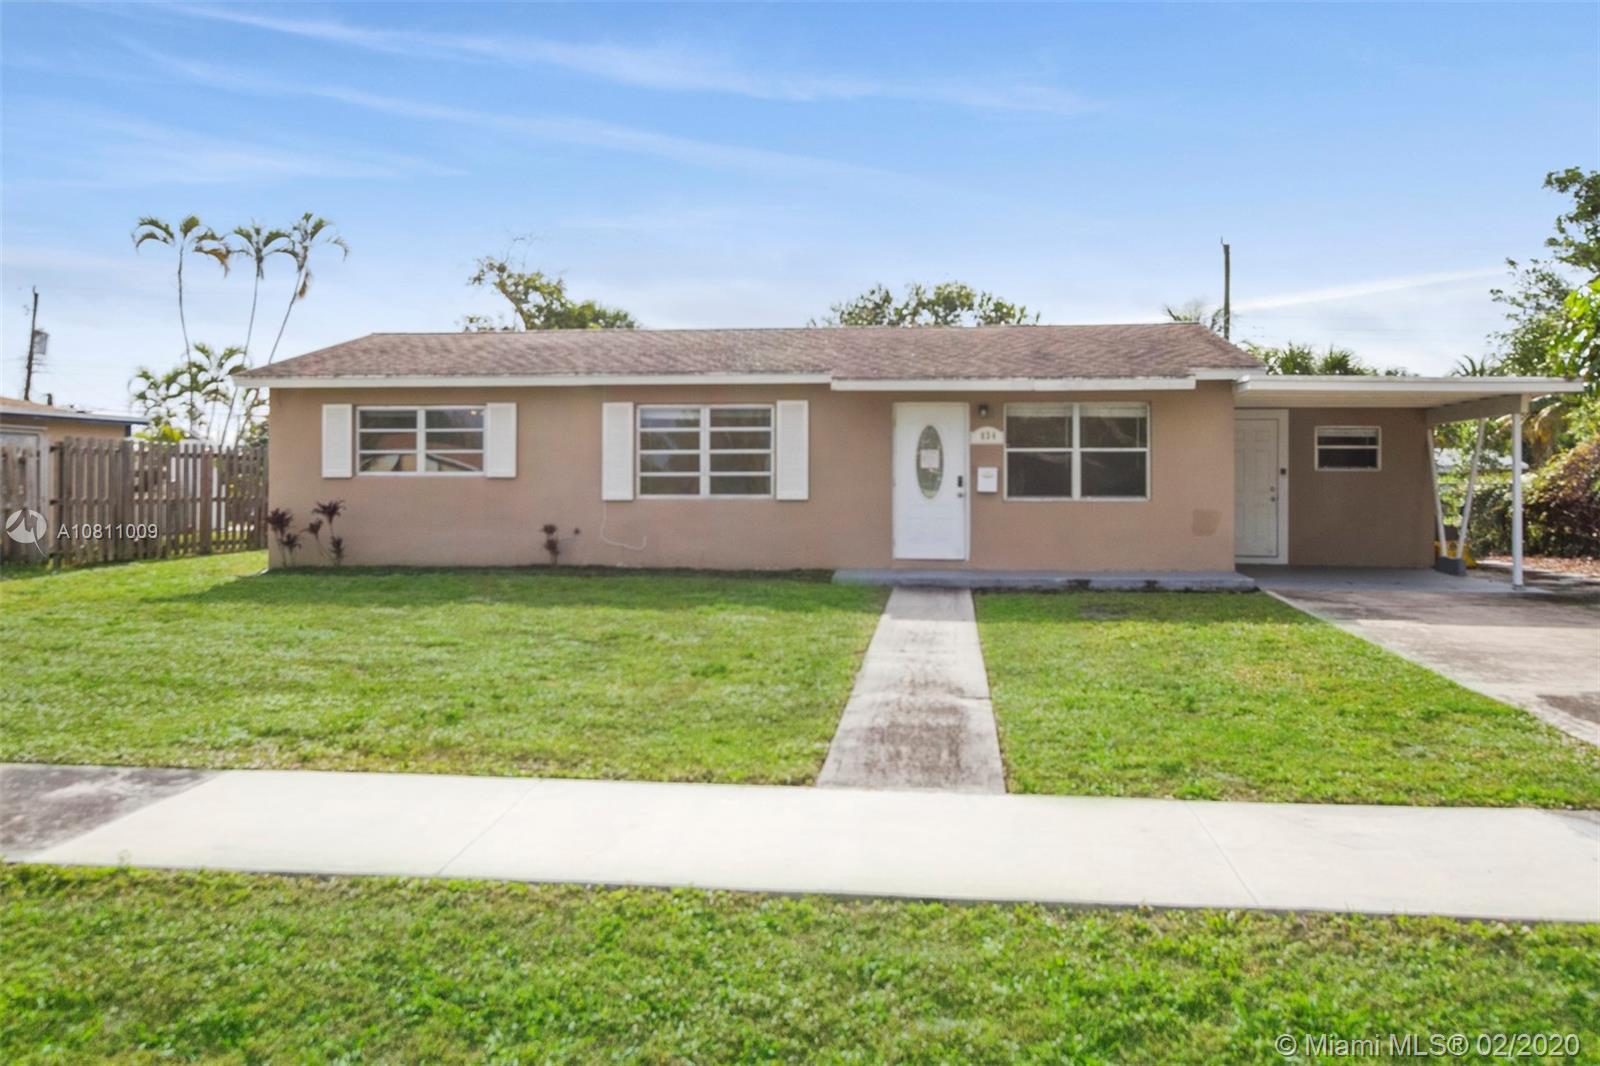 834 Magnolia Dr, Lake Park, FL 33403